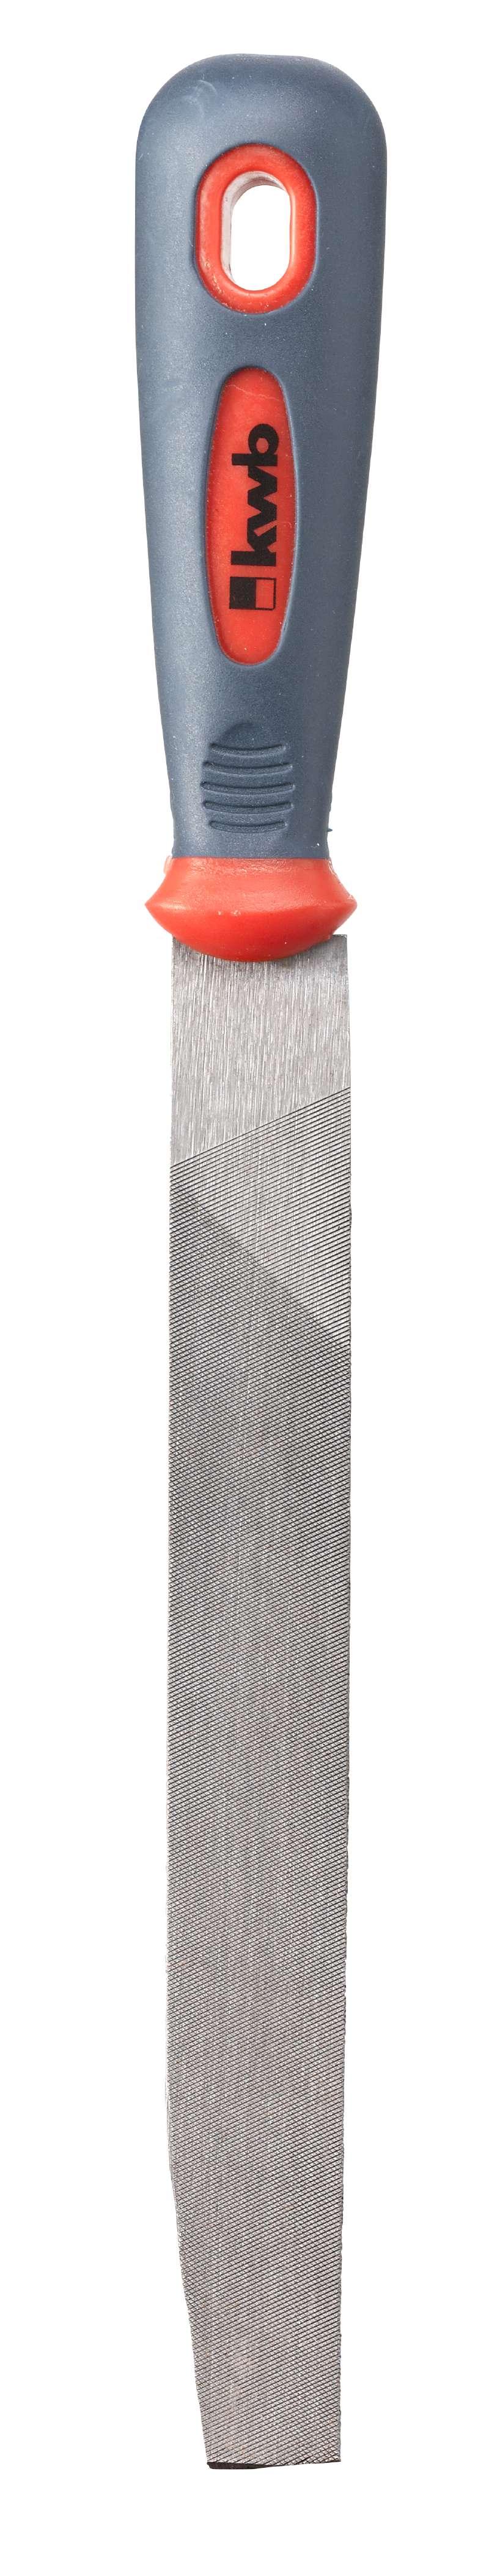 Напильник по металлу Kwb 4803-80